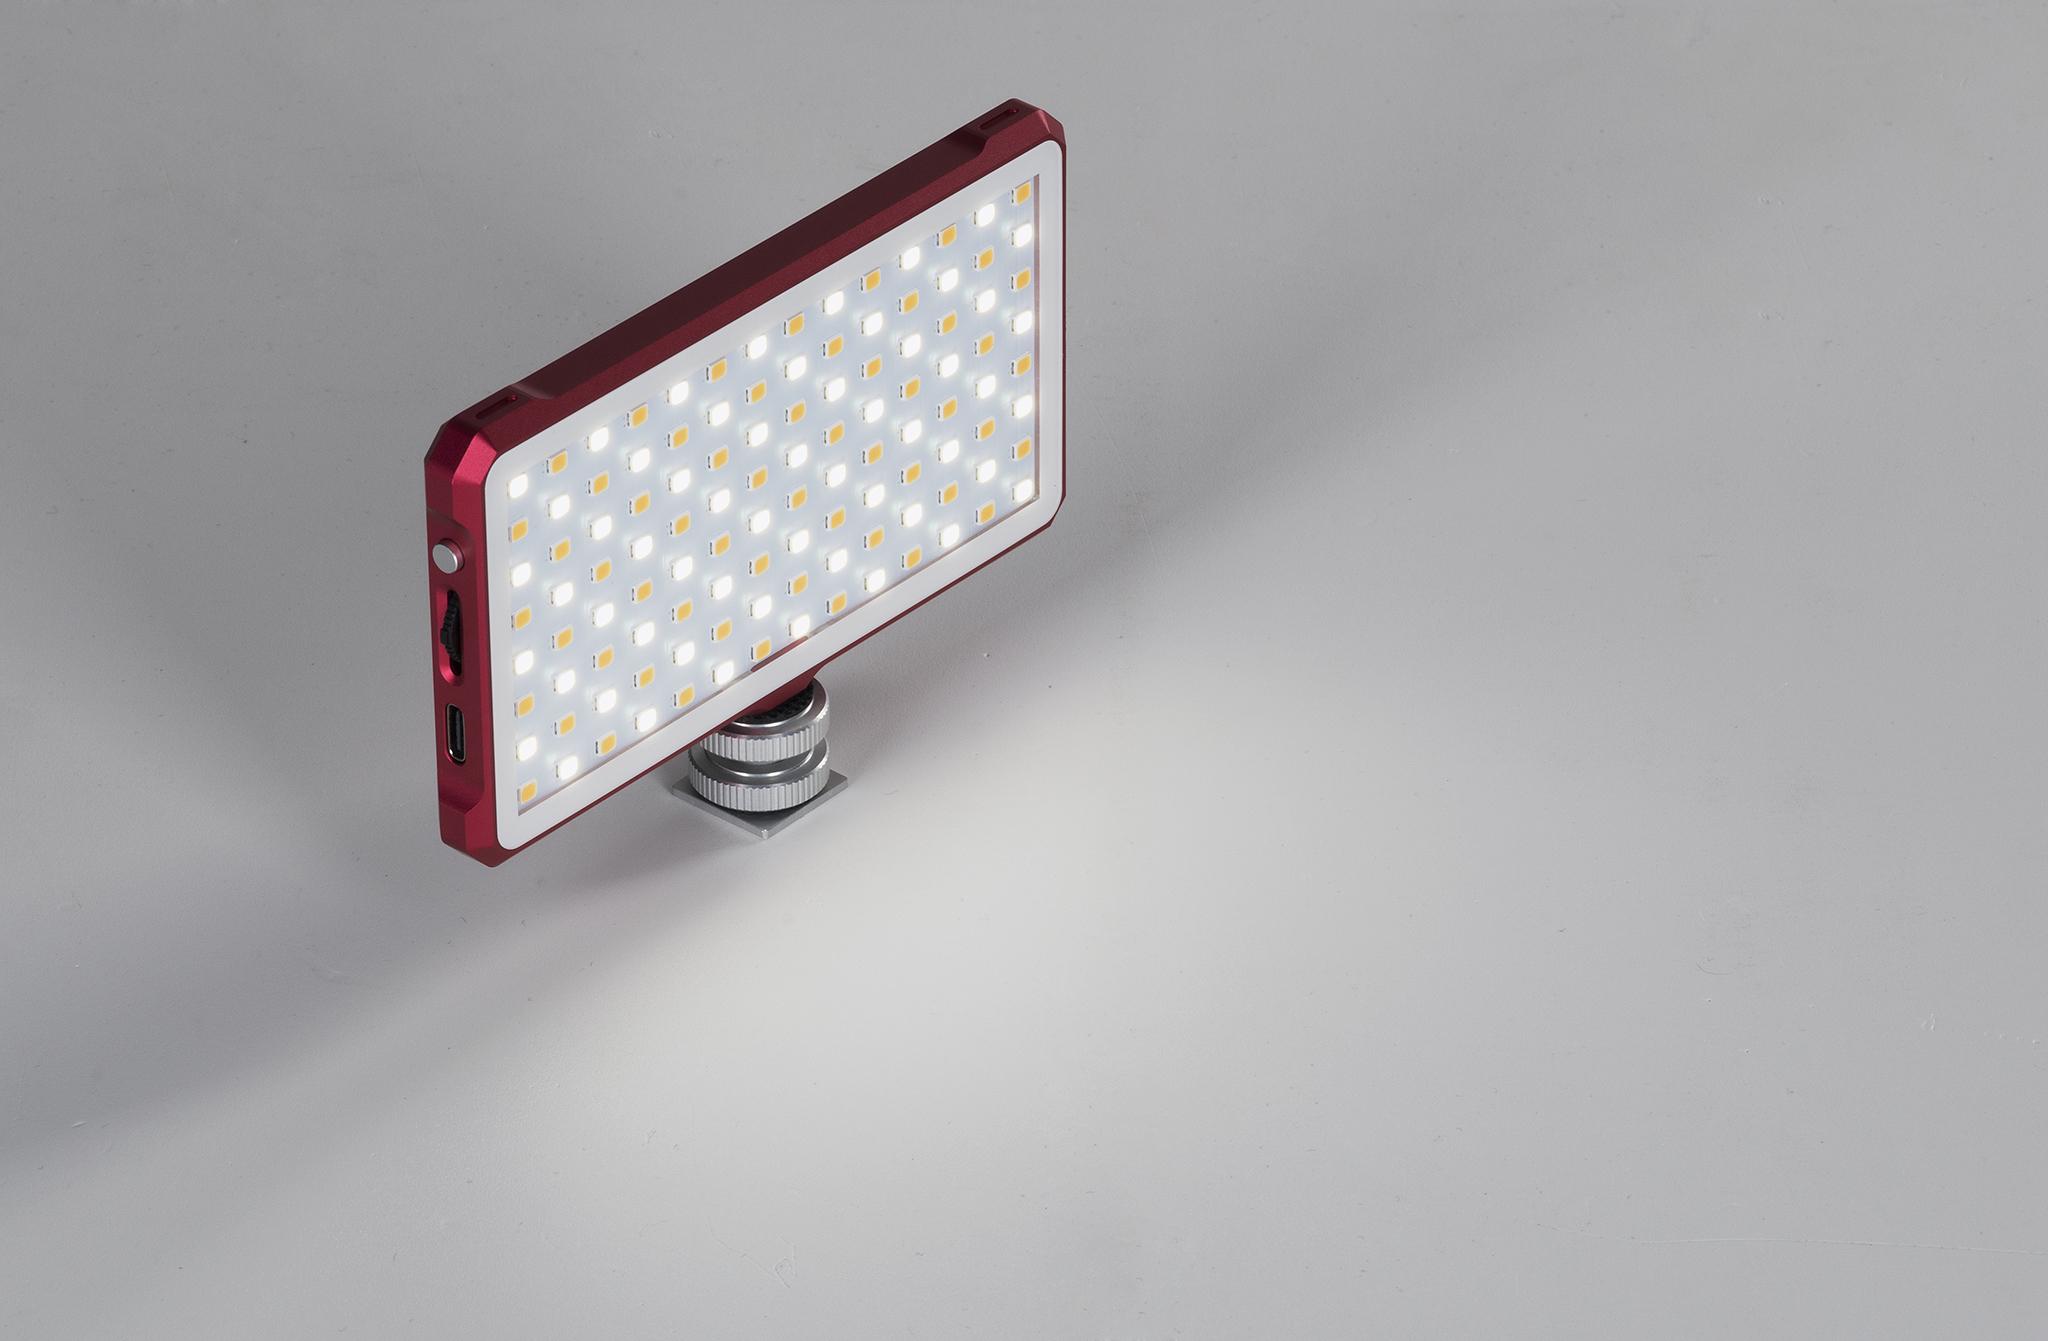 Quadralite MiLED Bi-Color 112 LED Light